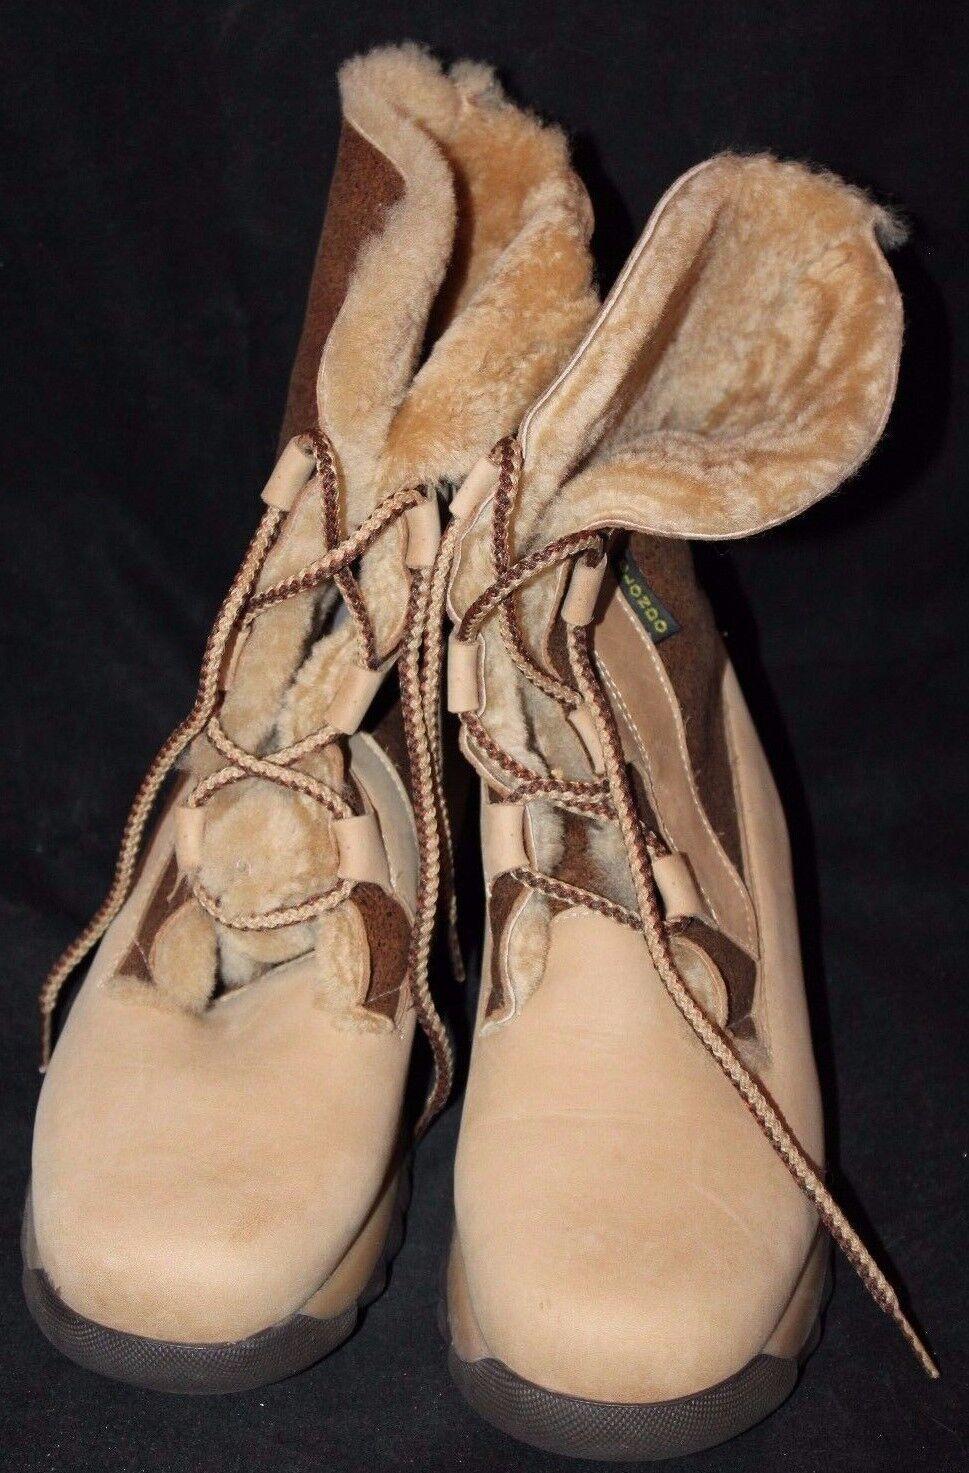 Blondo Shearling Women's Lace Up Winter Boots Size 7.5 Medium